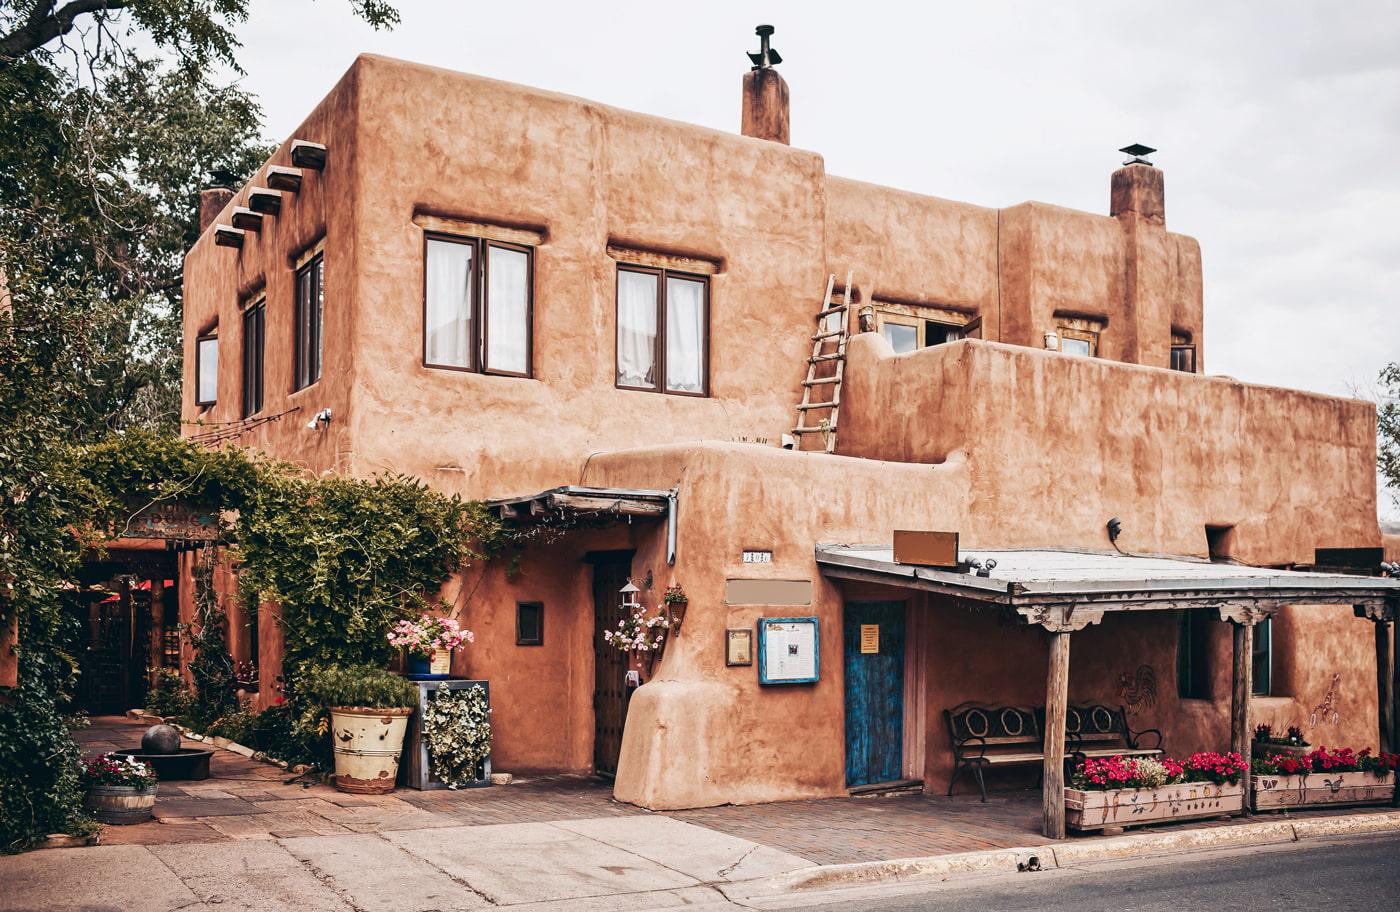 Adobe architecture in Santa Fe